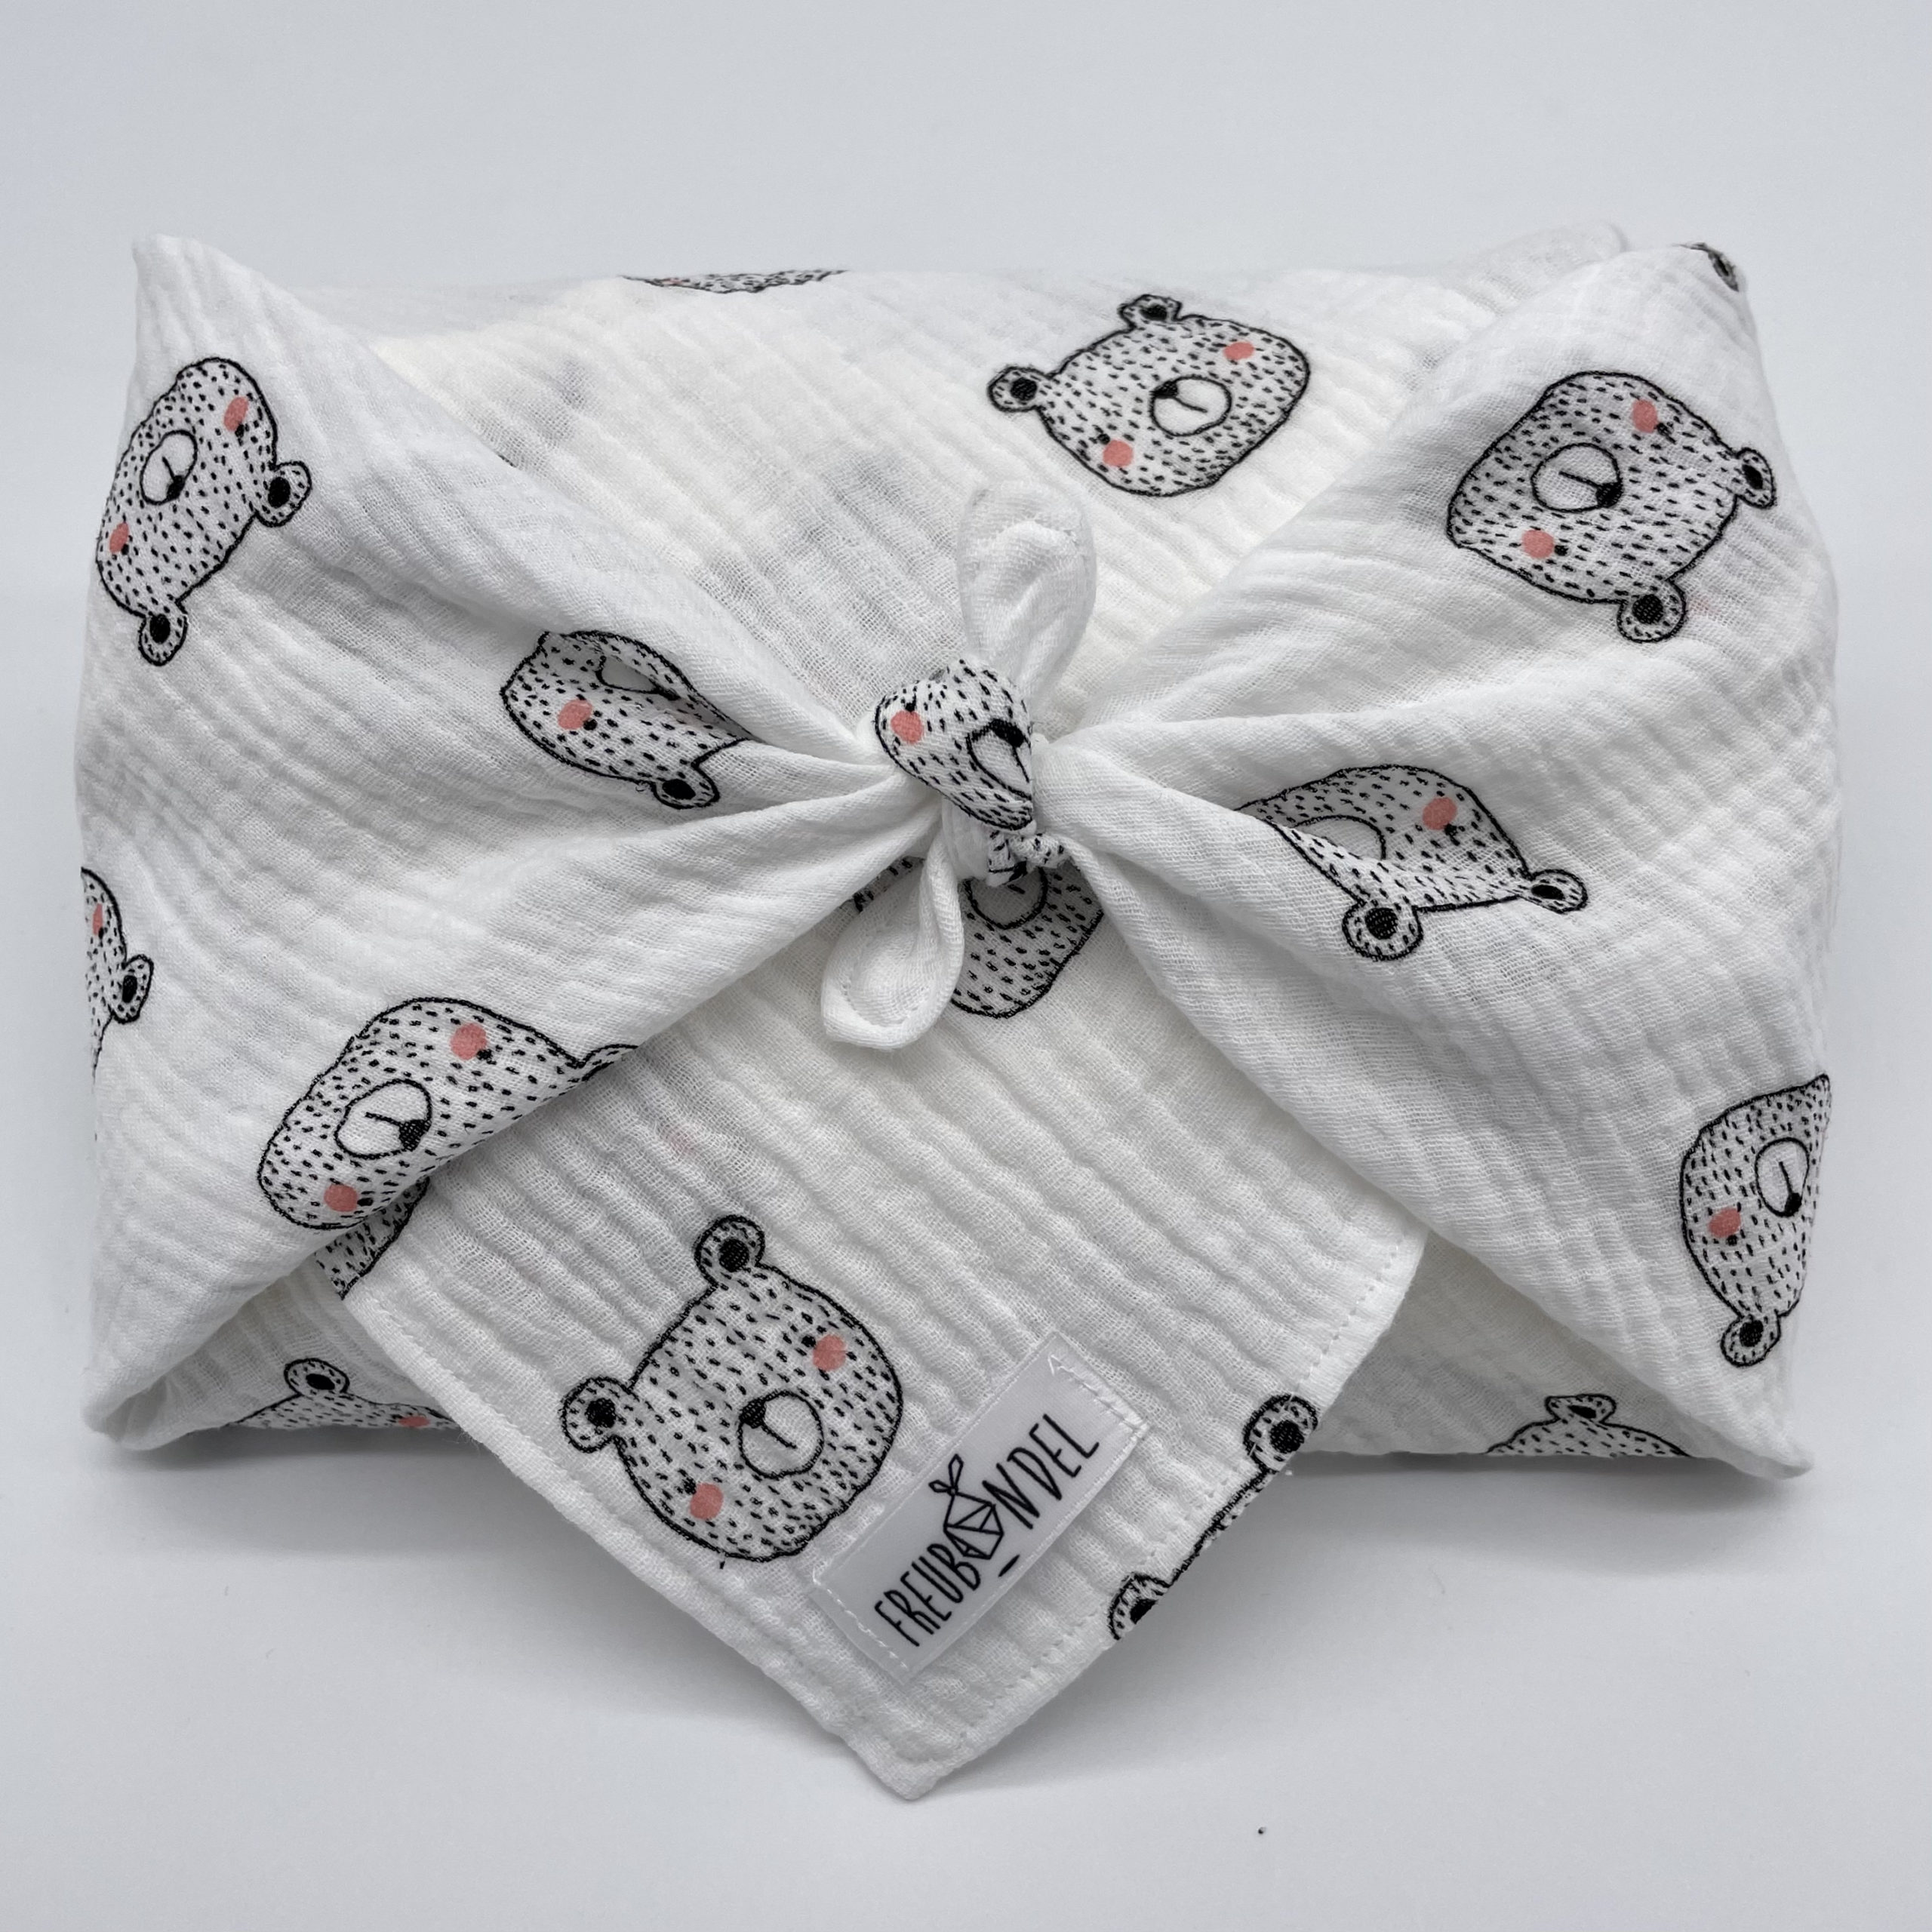 Geschenkverpackung Furoshiki